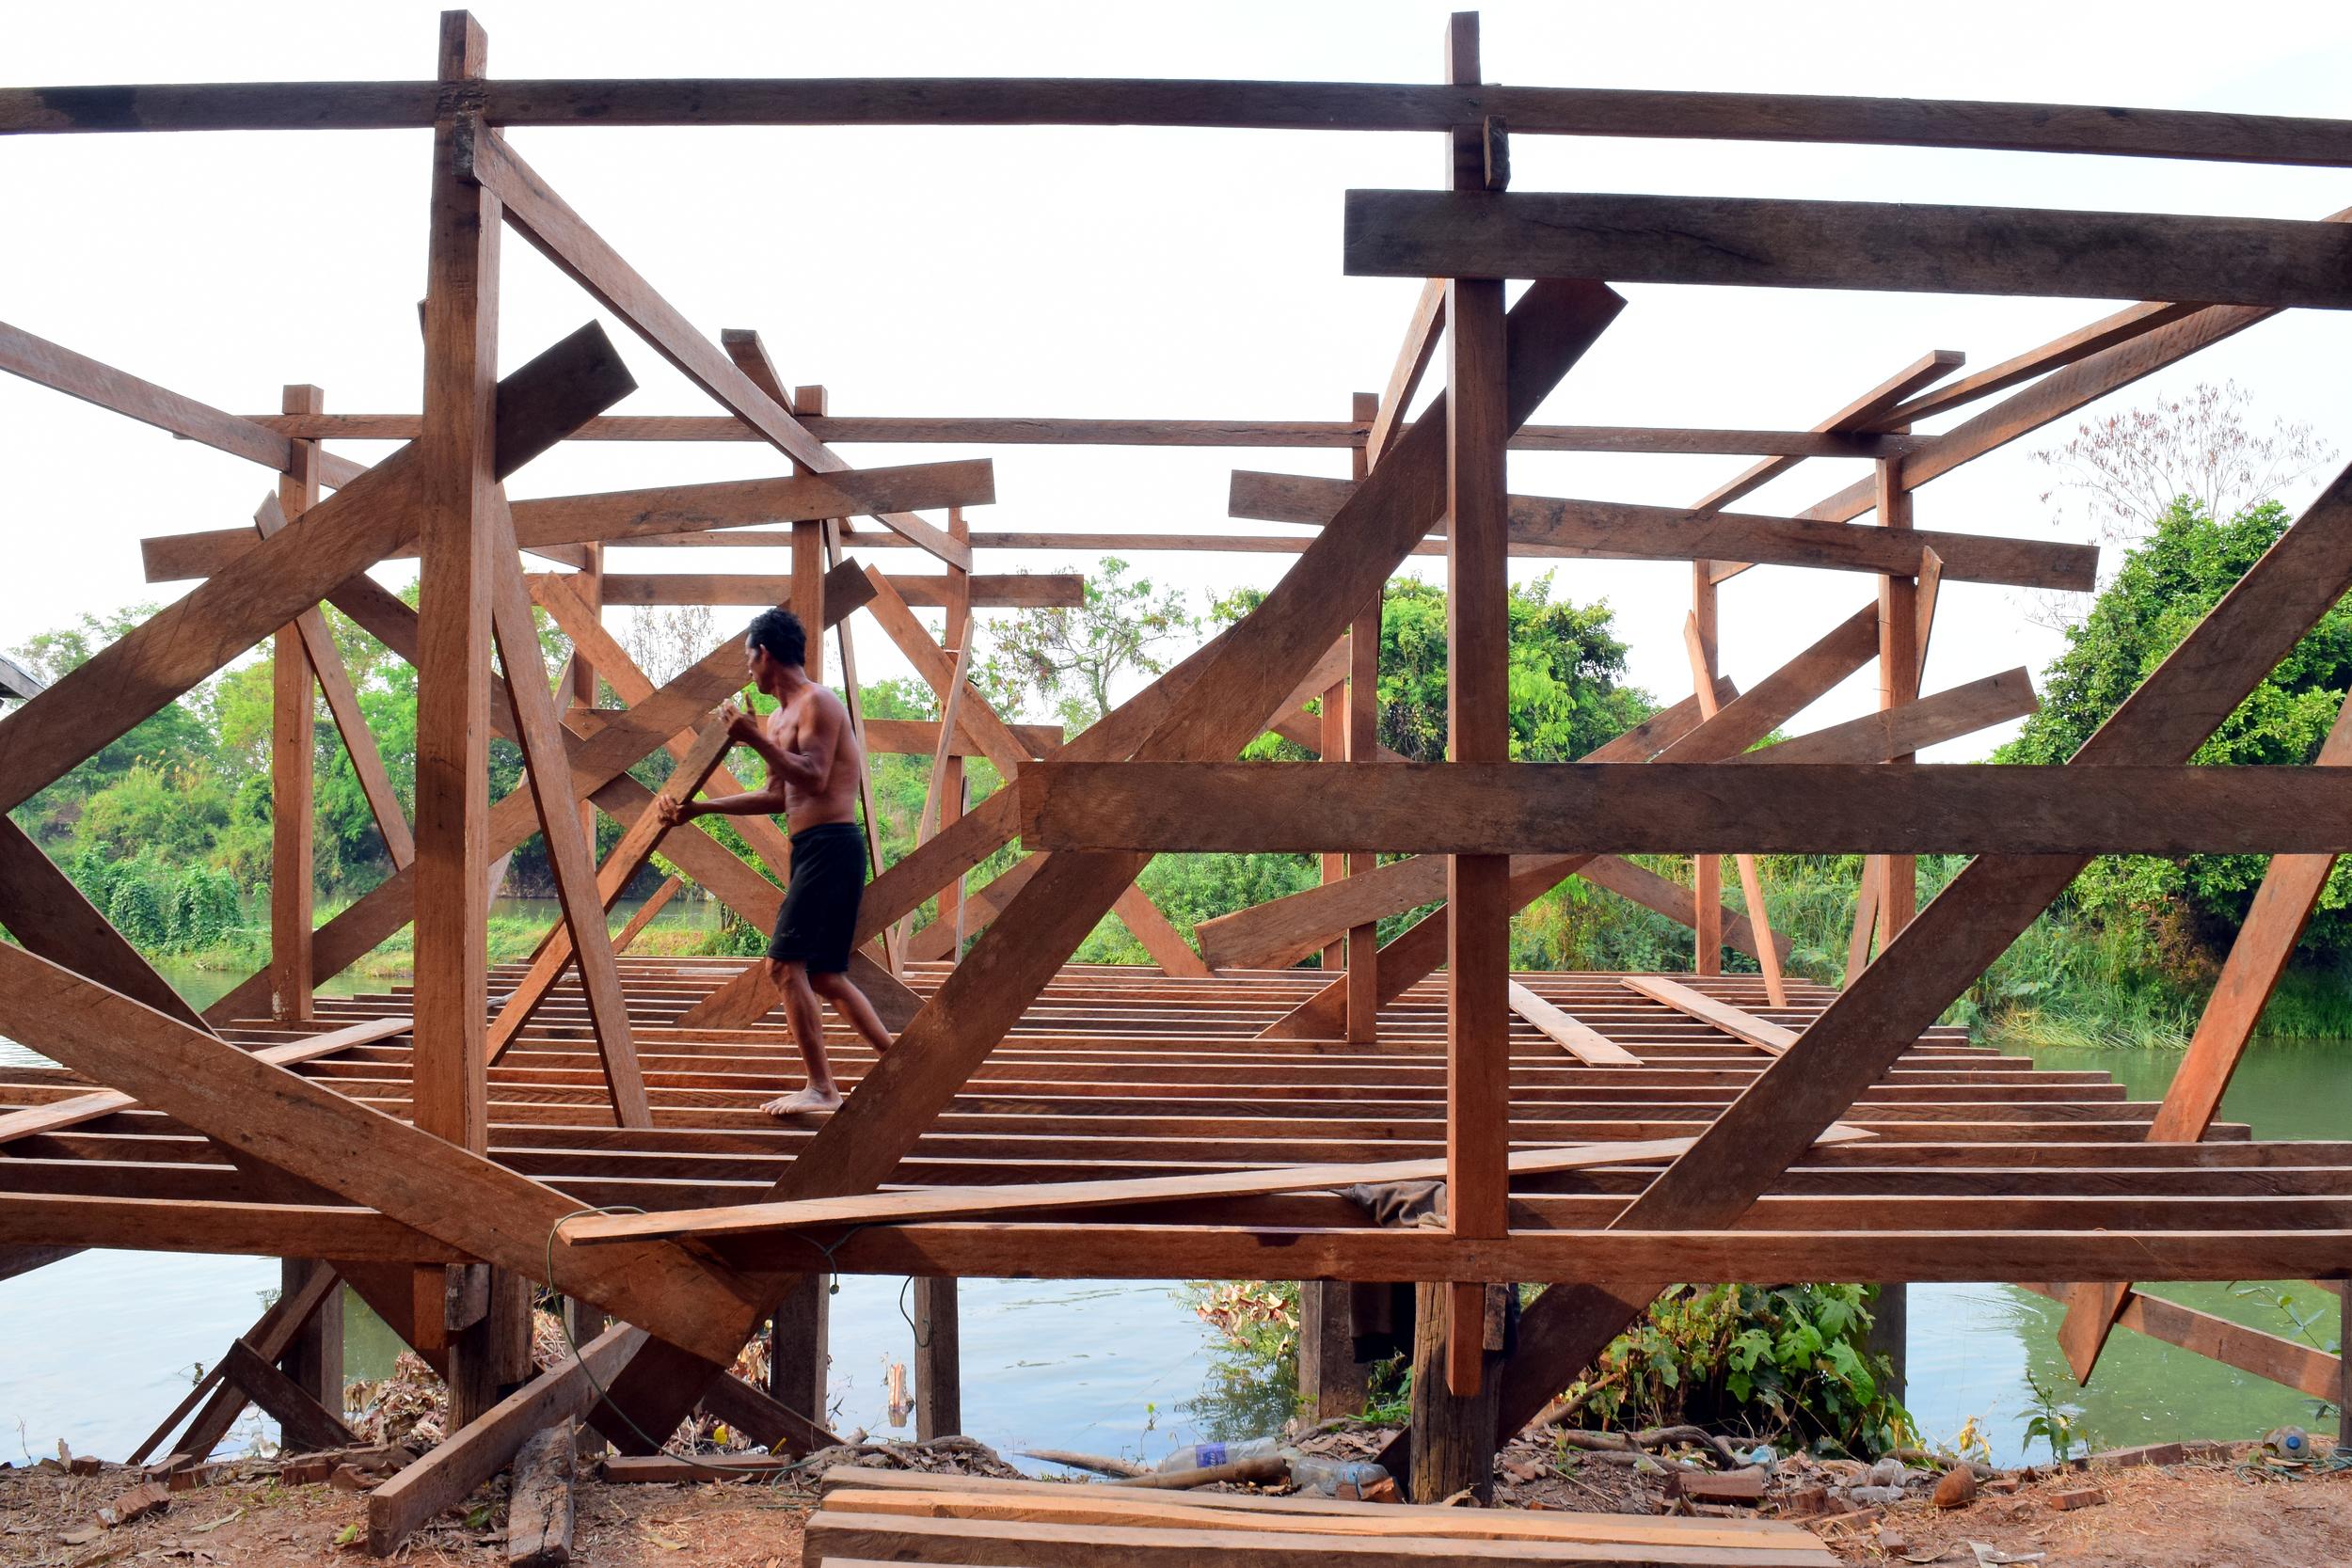 Don Det, 4000 Islands, Laos 2015